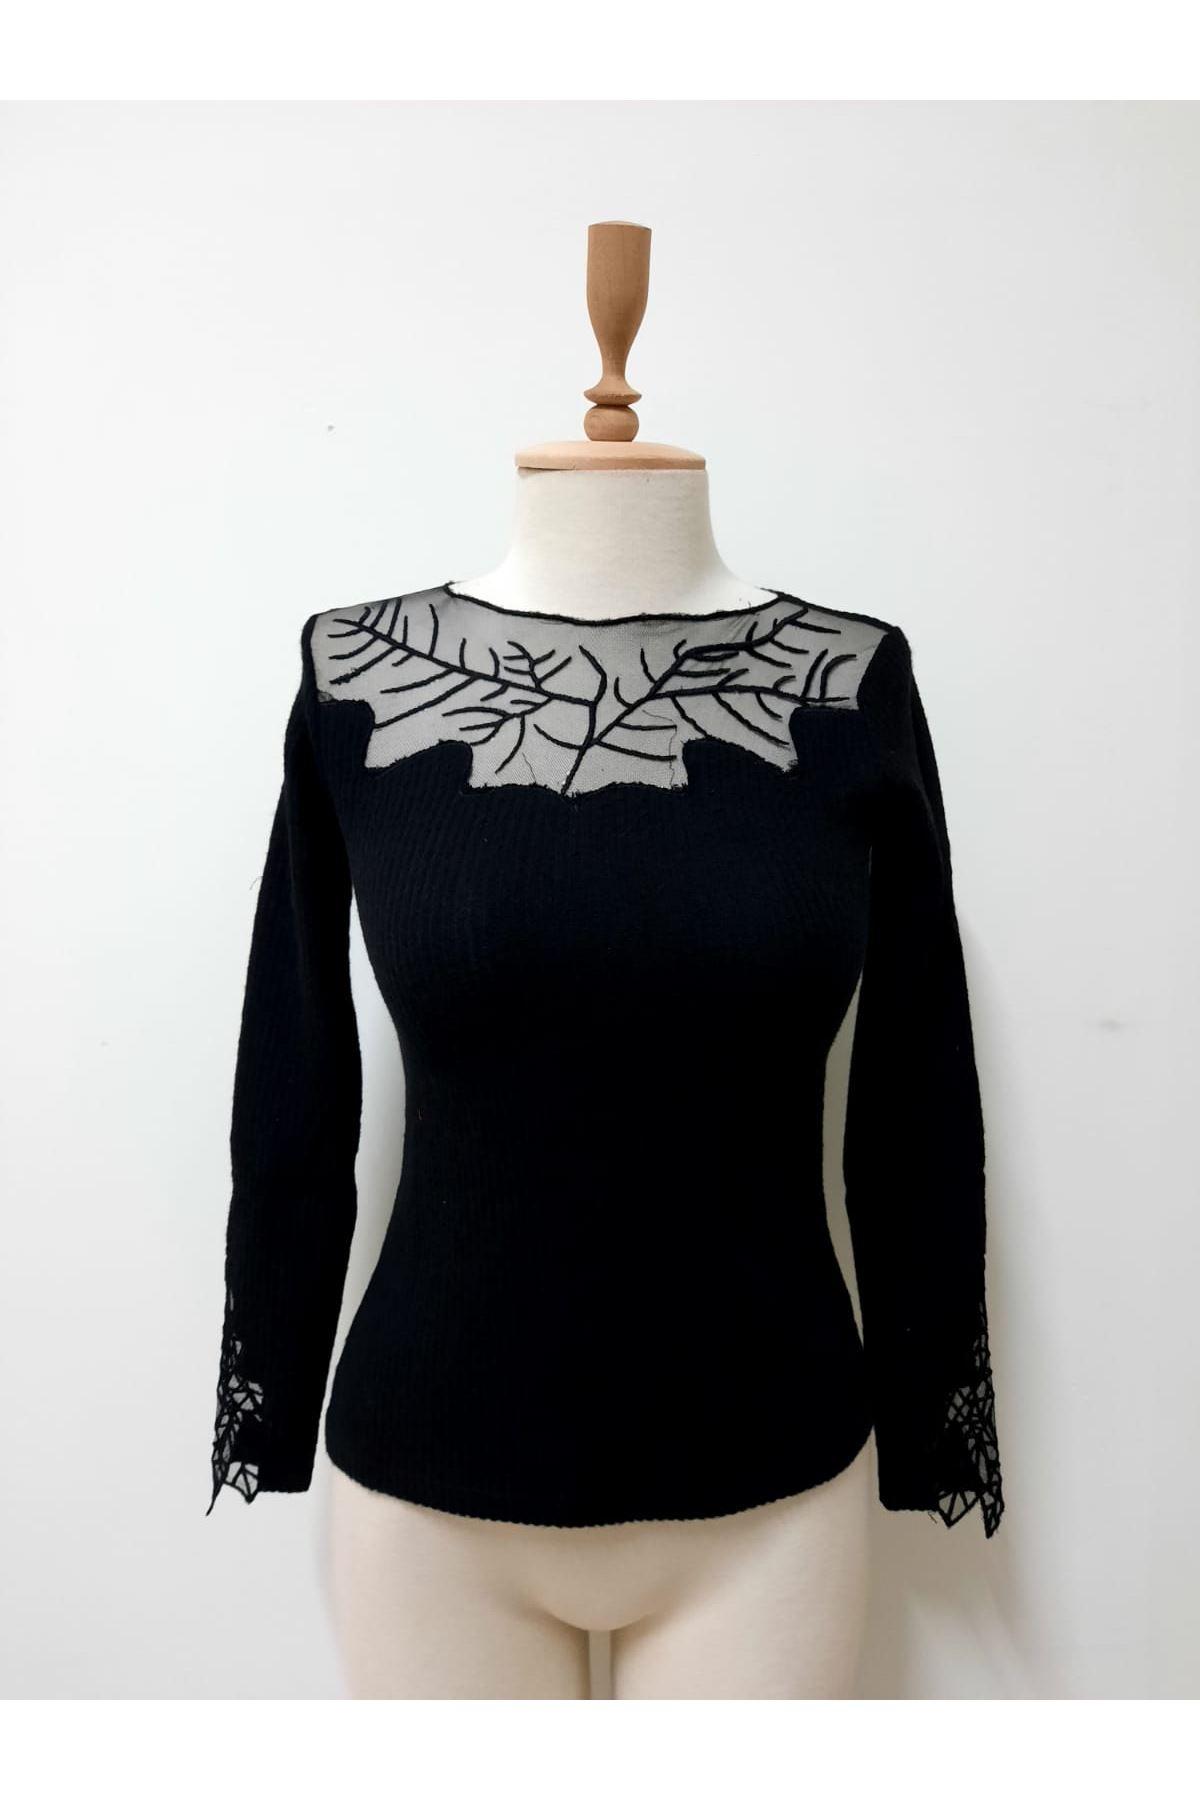 Akrelik Tül Tasarım Bluz - siyah